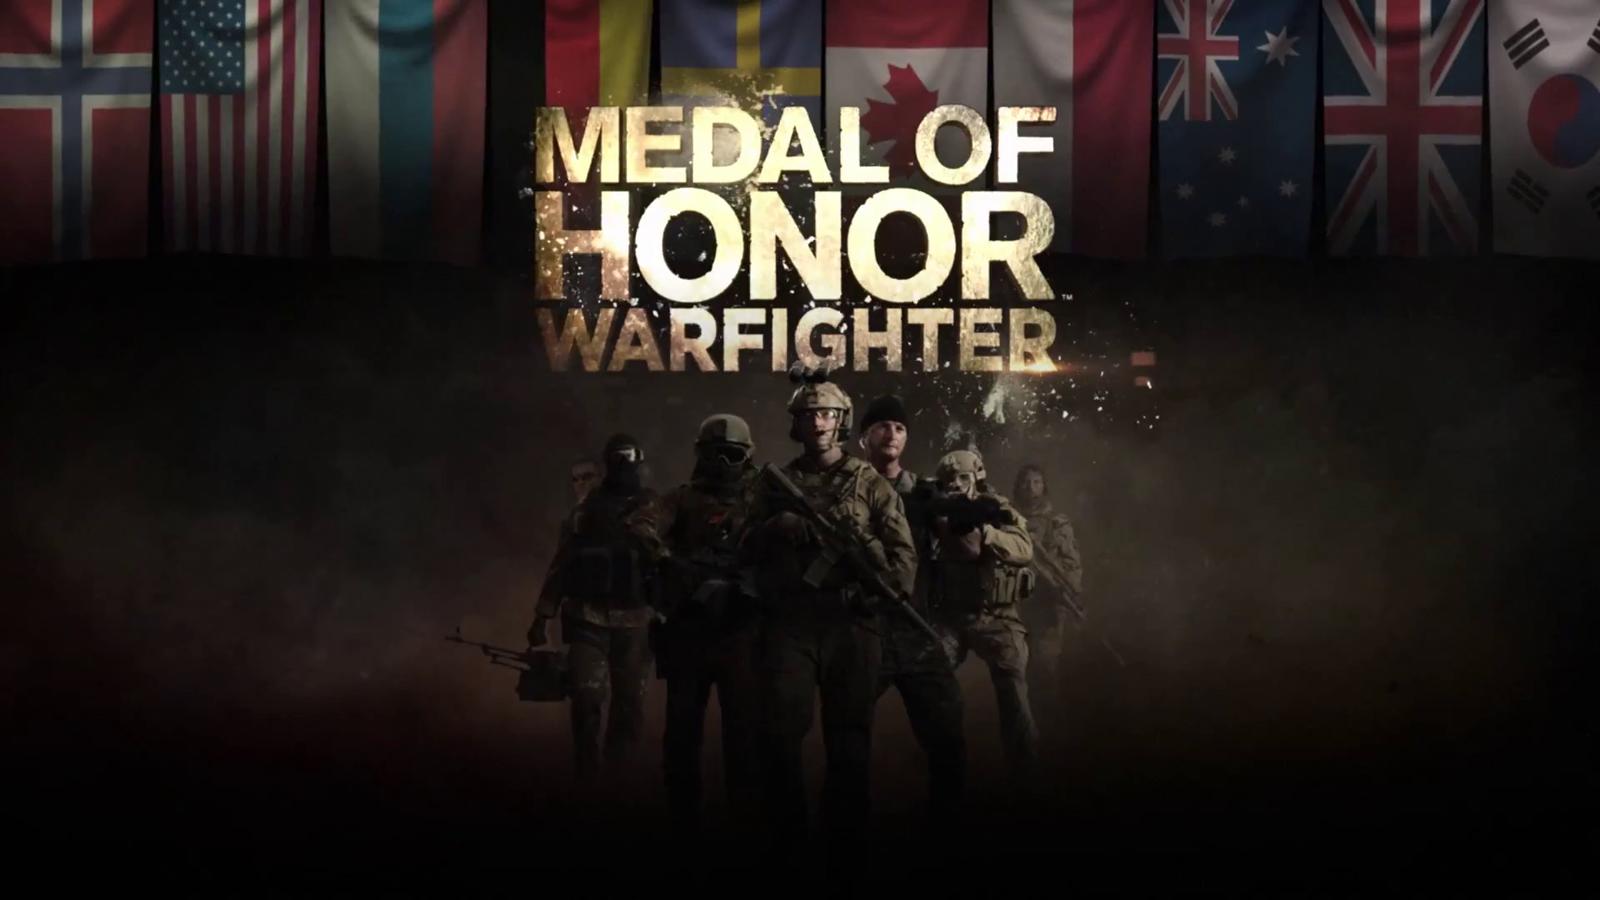 moh warfighter wallpaper hd - photo #6